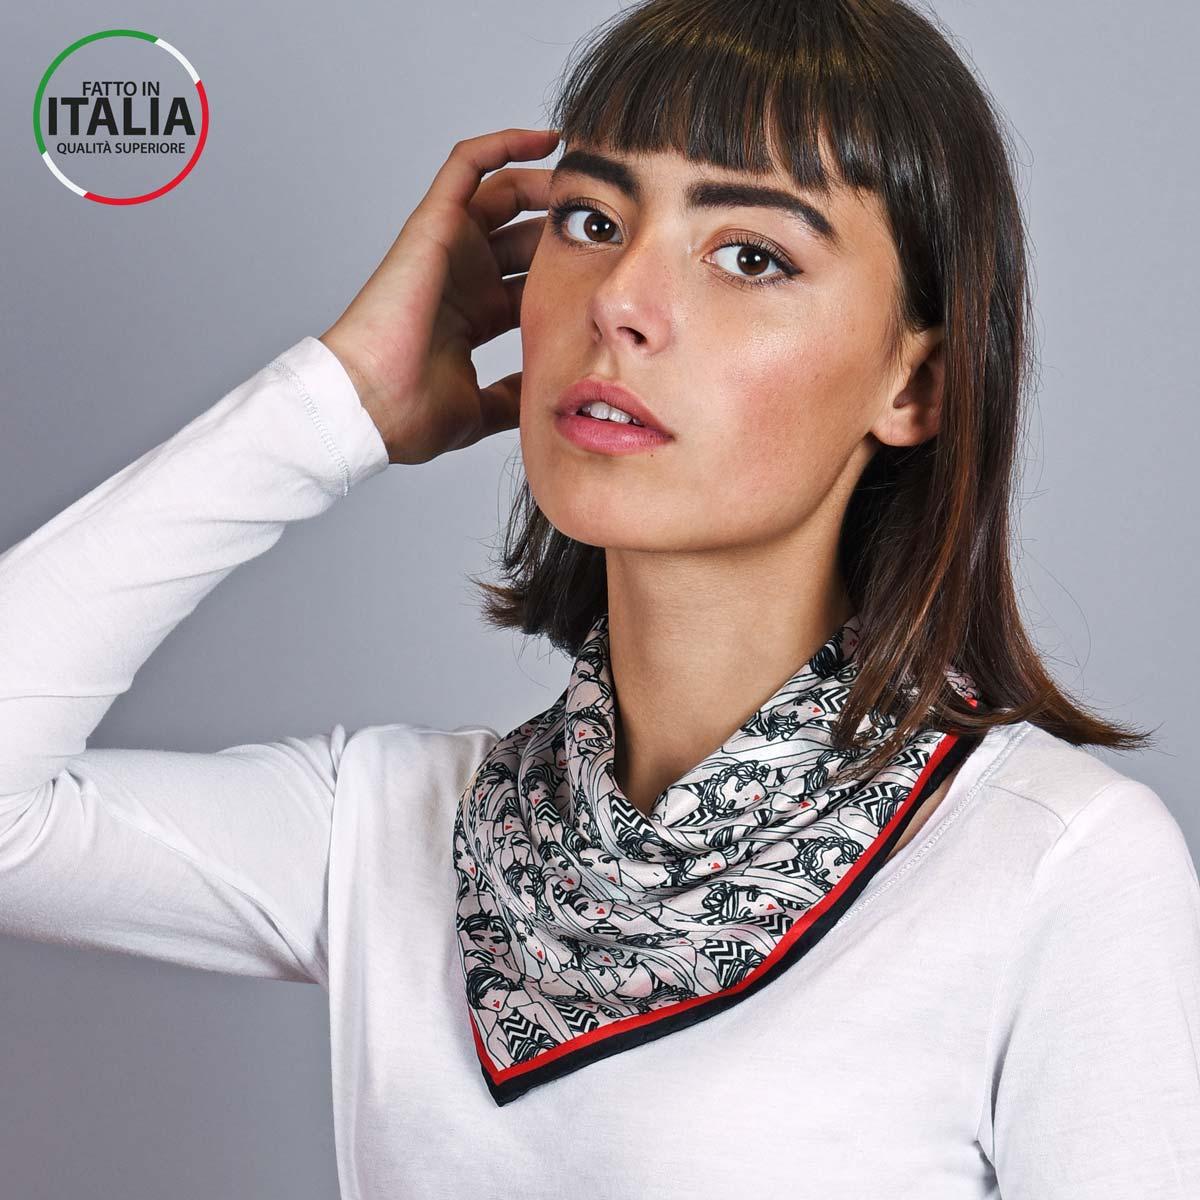 AT-05391_W12-1IT_Carre-soie-noir-femmes-65x65-made-in-italie